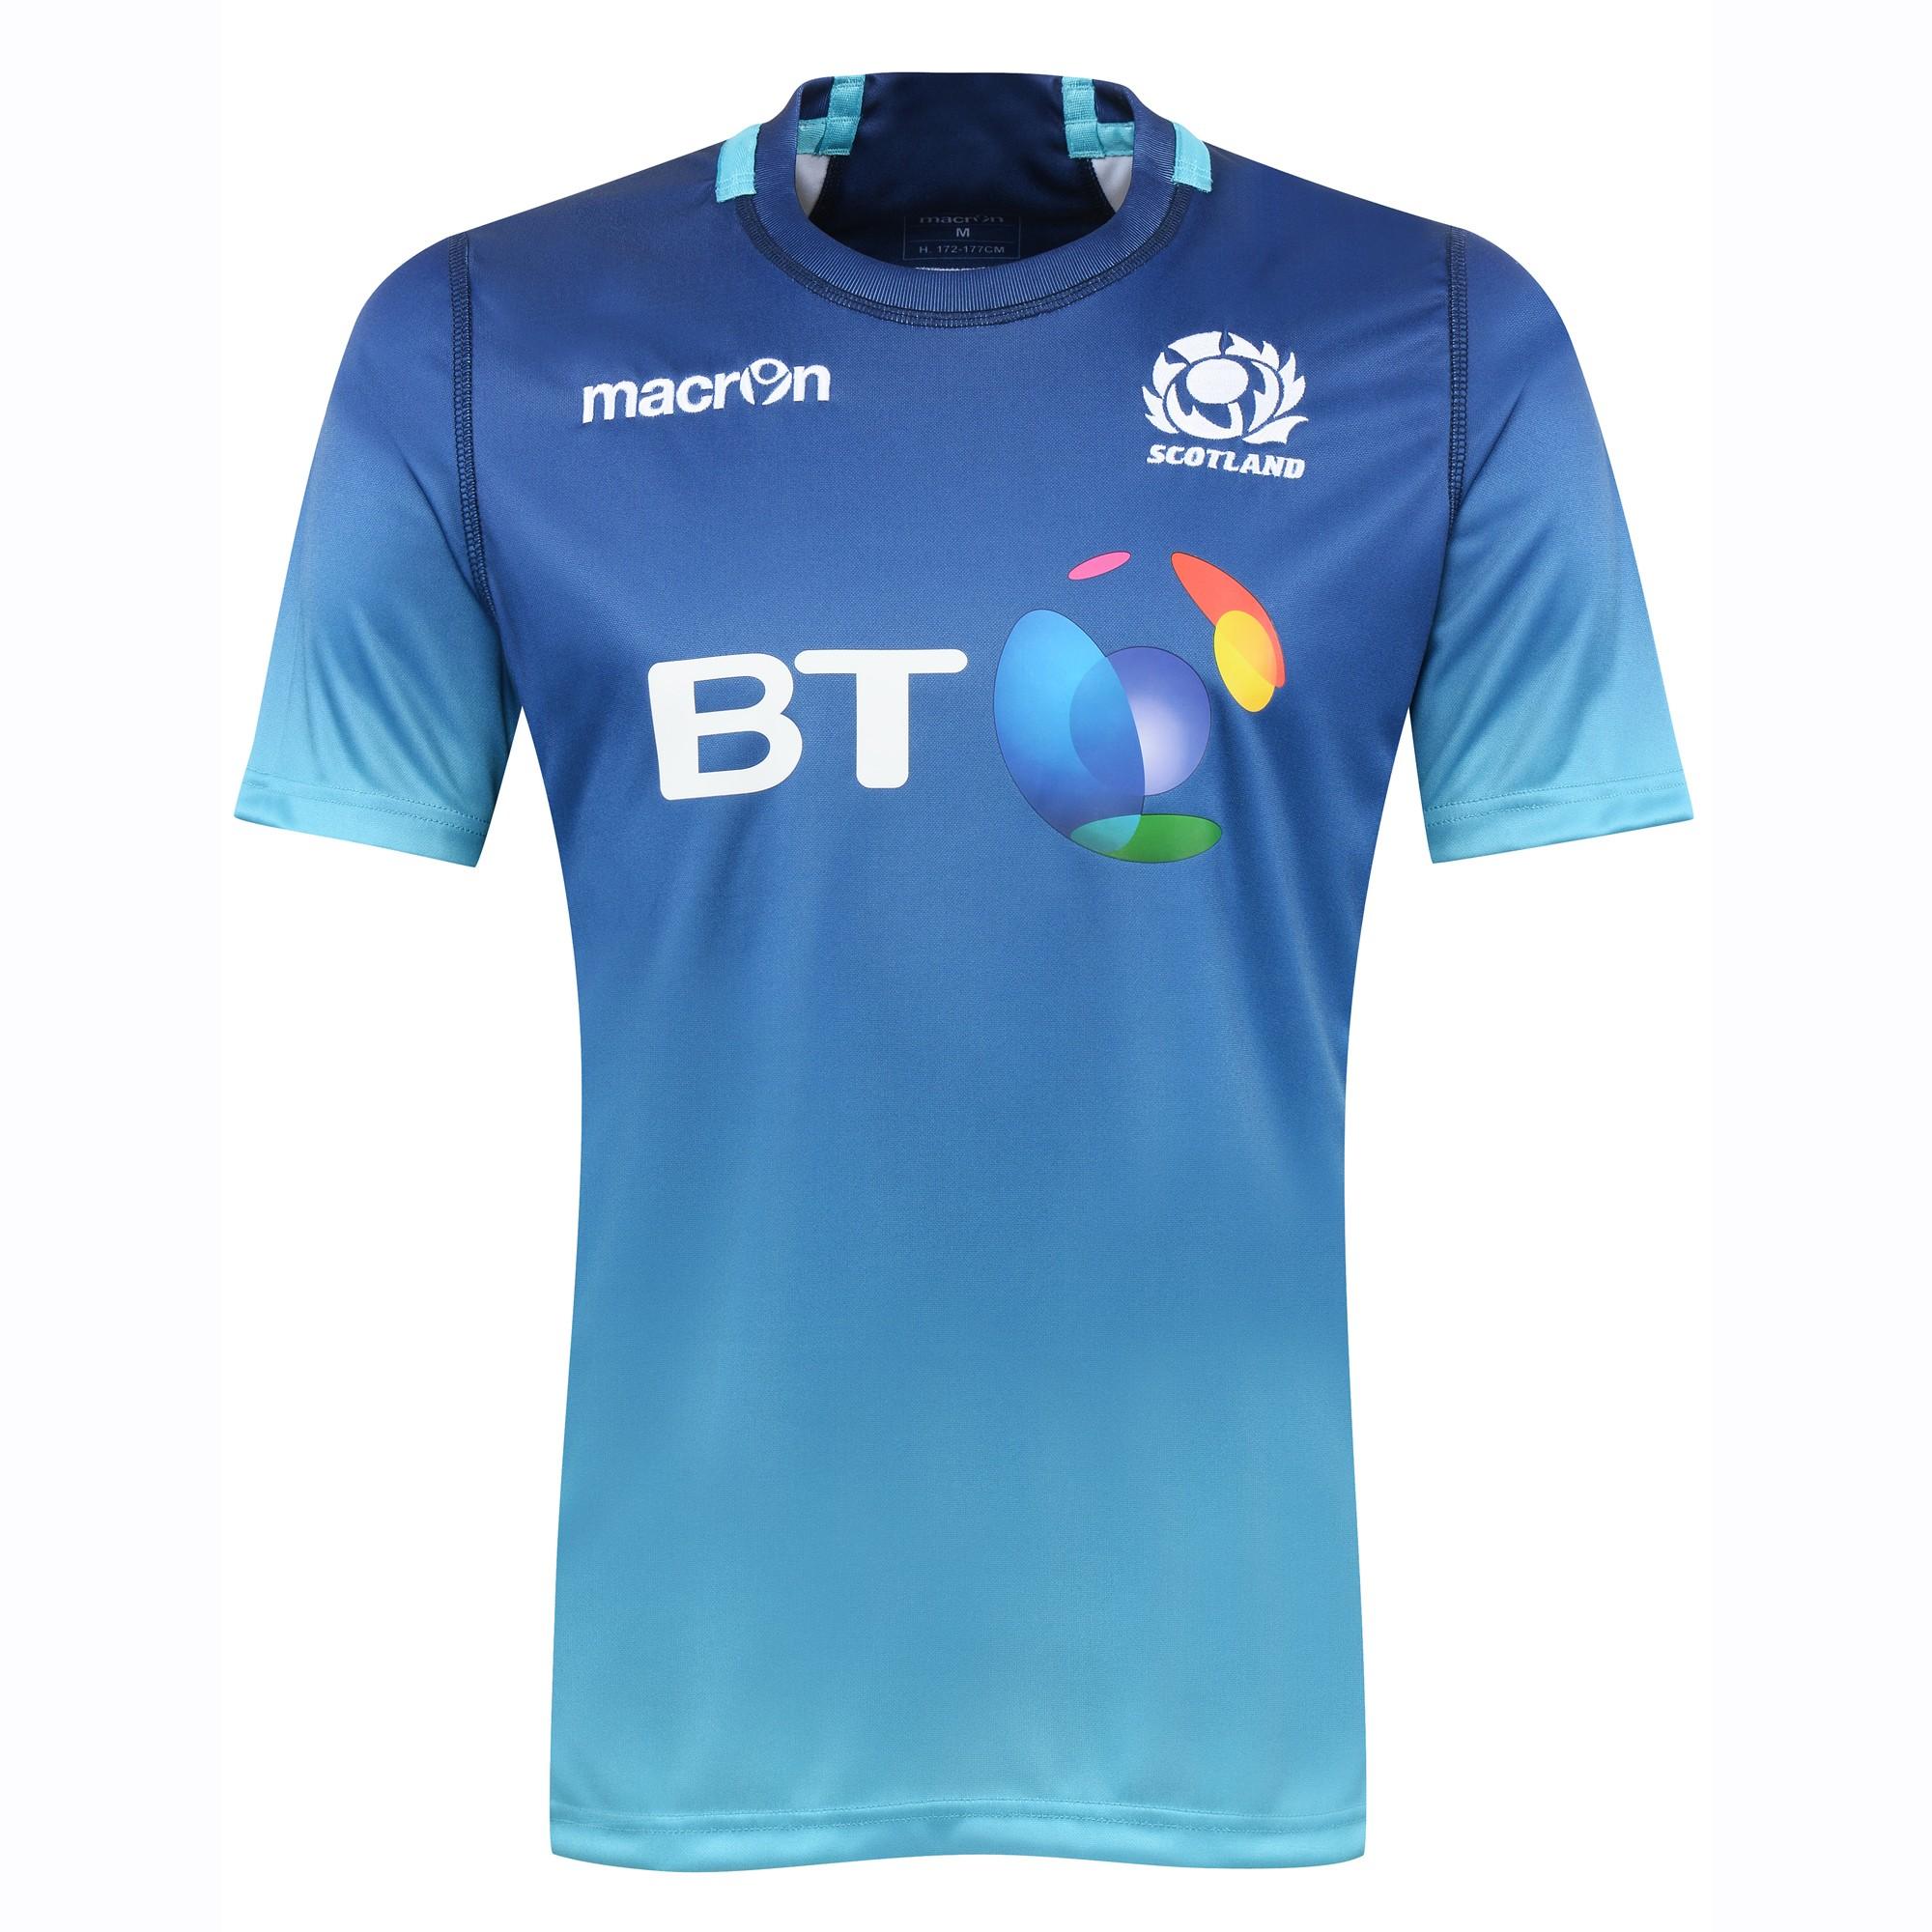 2016-2017 Scotland Macron Rugby Training Jersey (Turquoise)